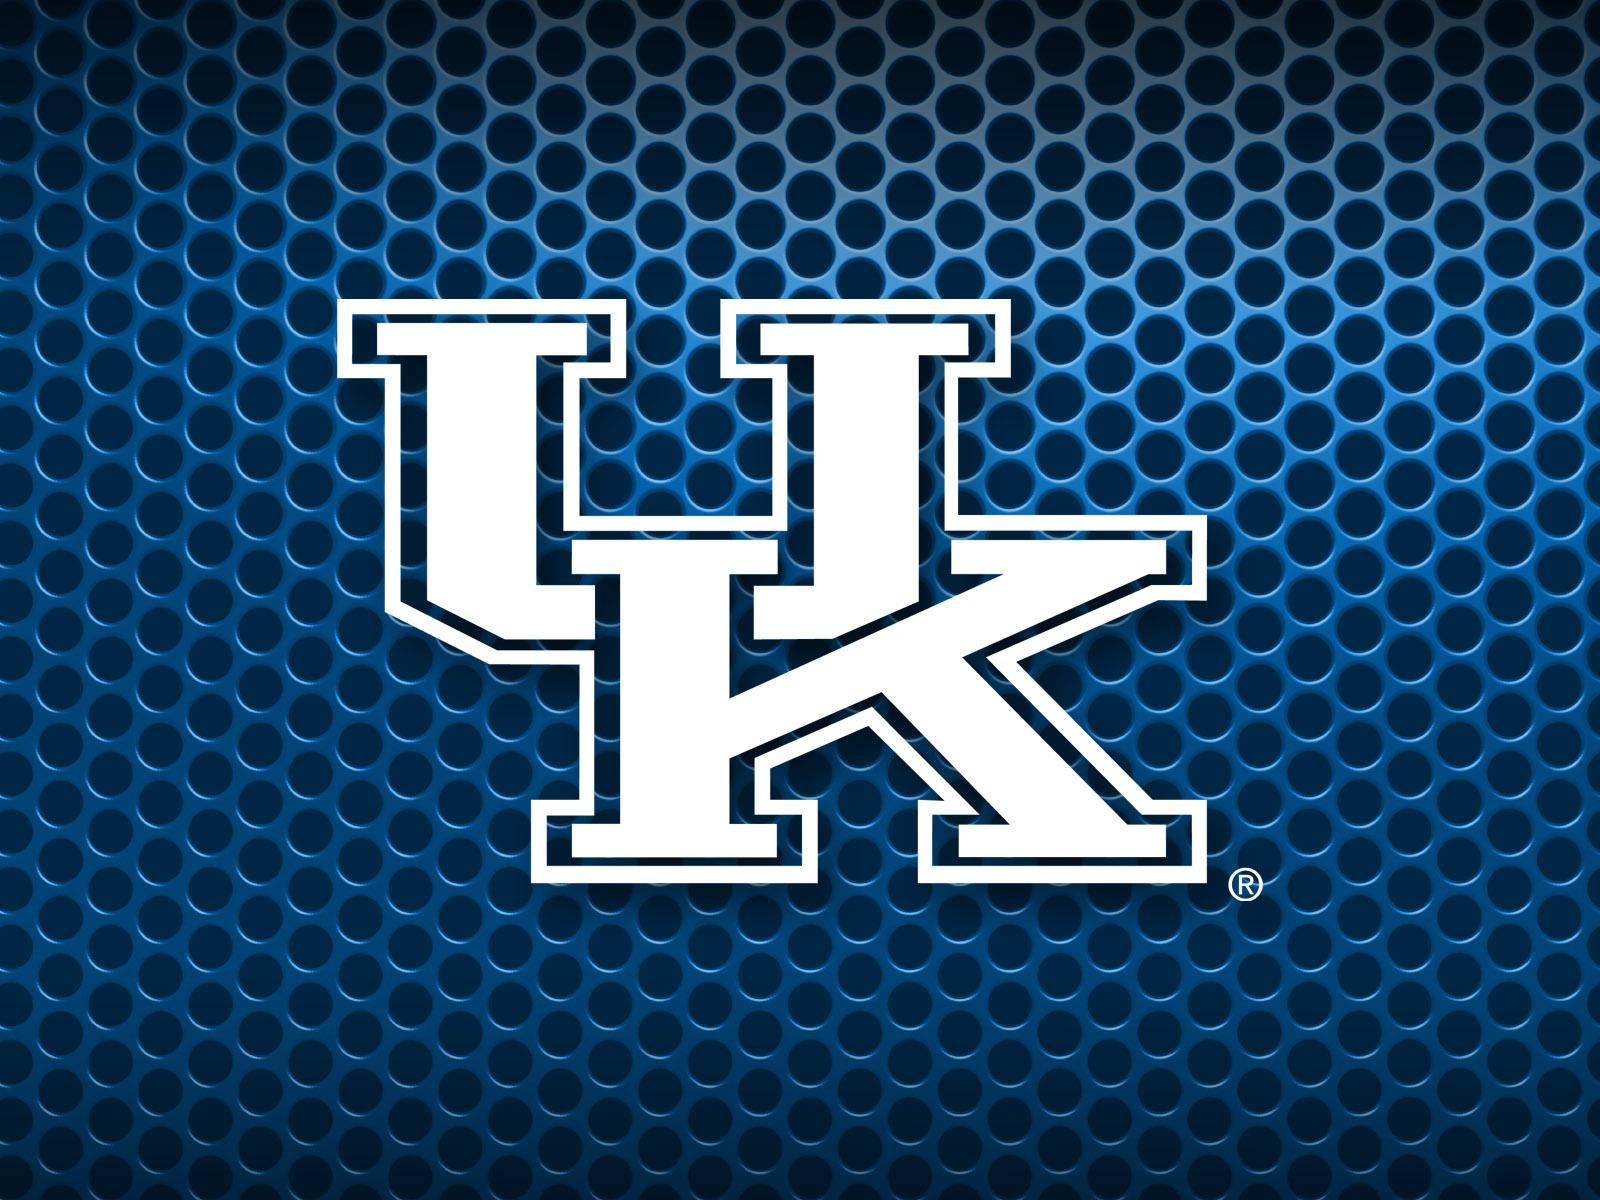 Kentucky Basketball Wallpaper for Desktop - WallpaperSafari